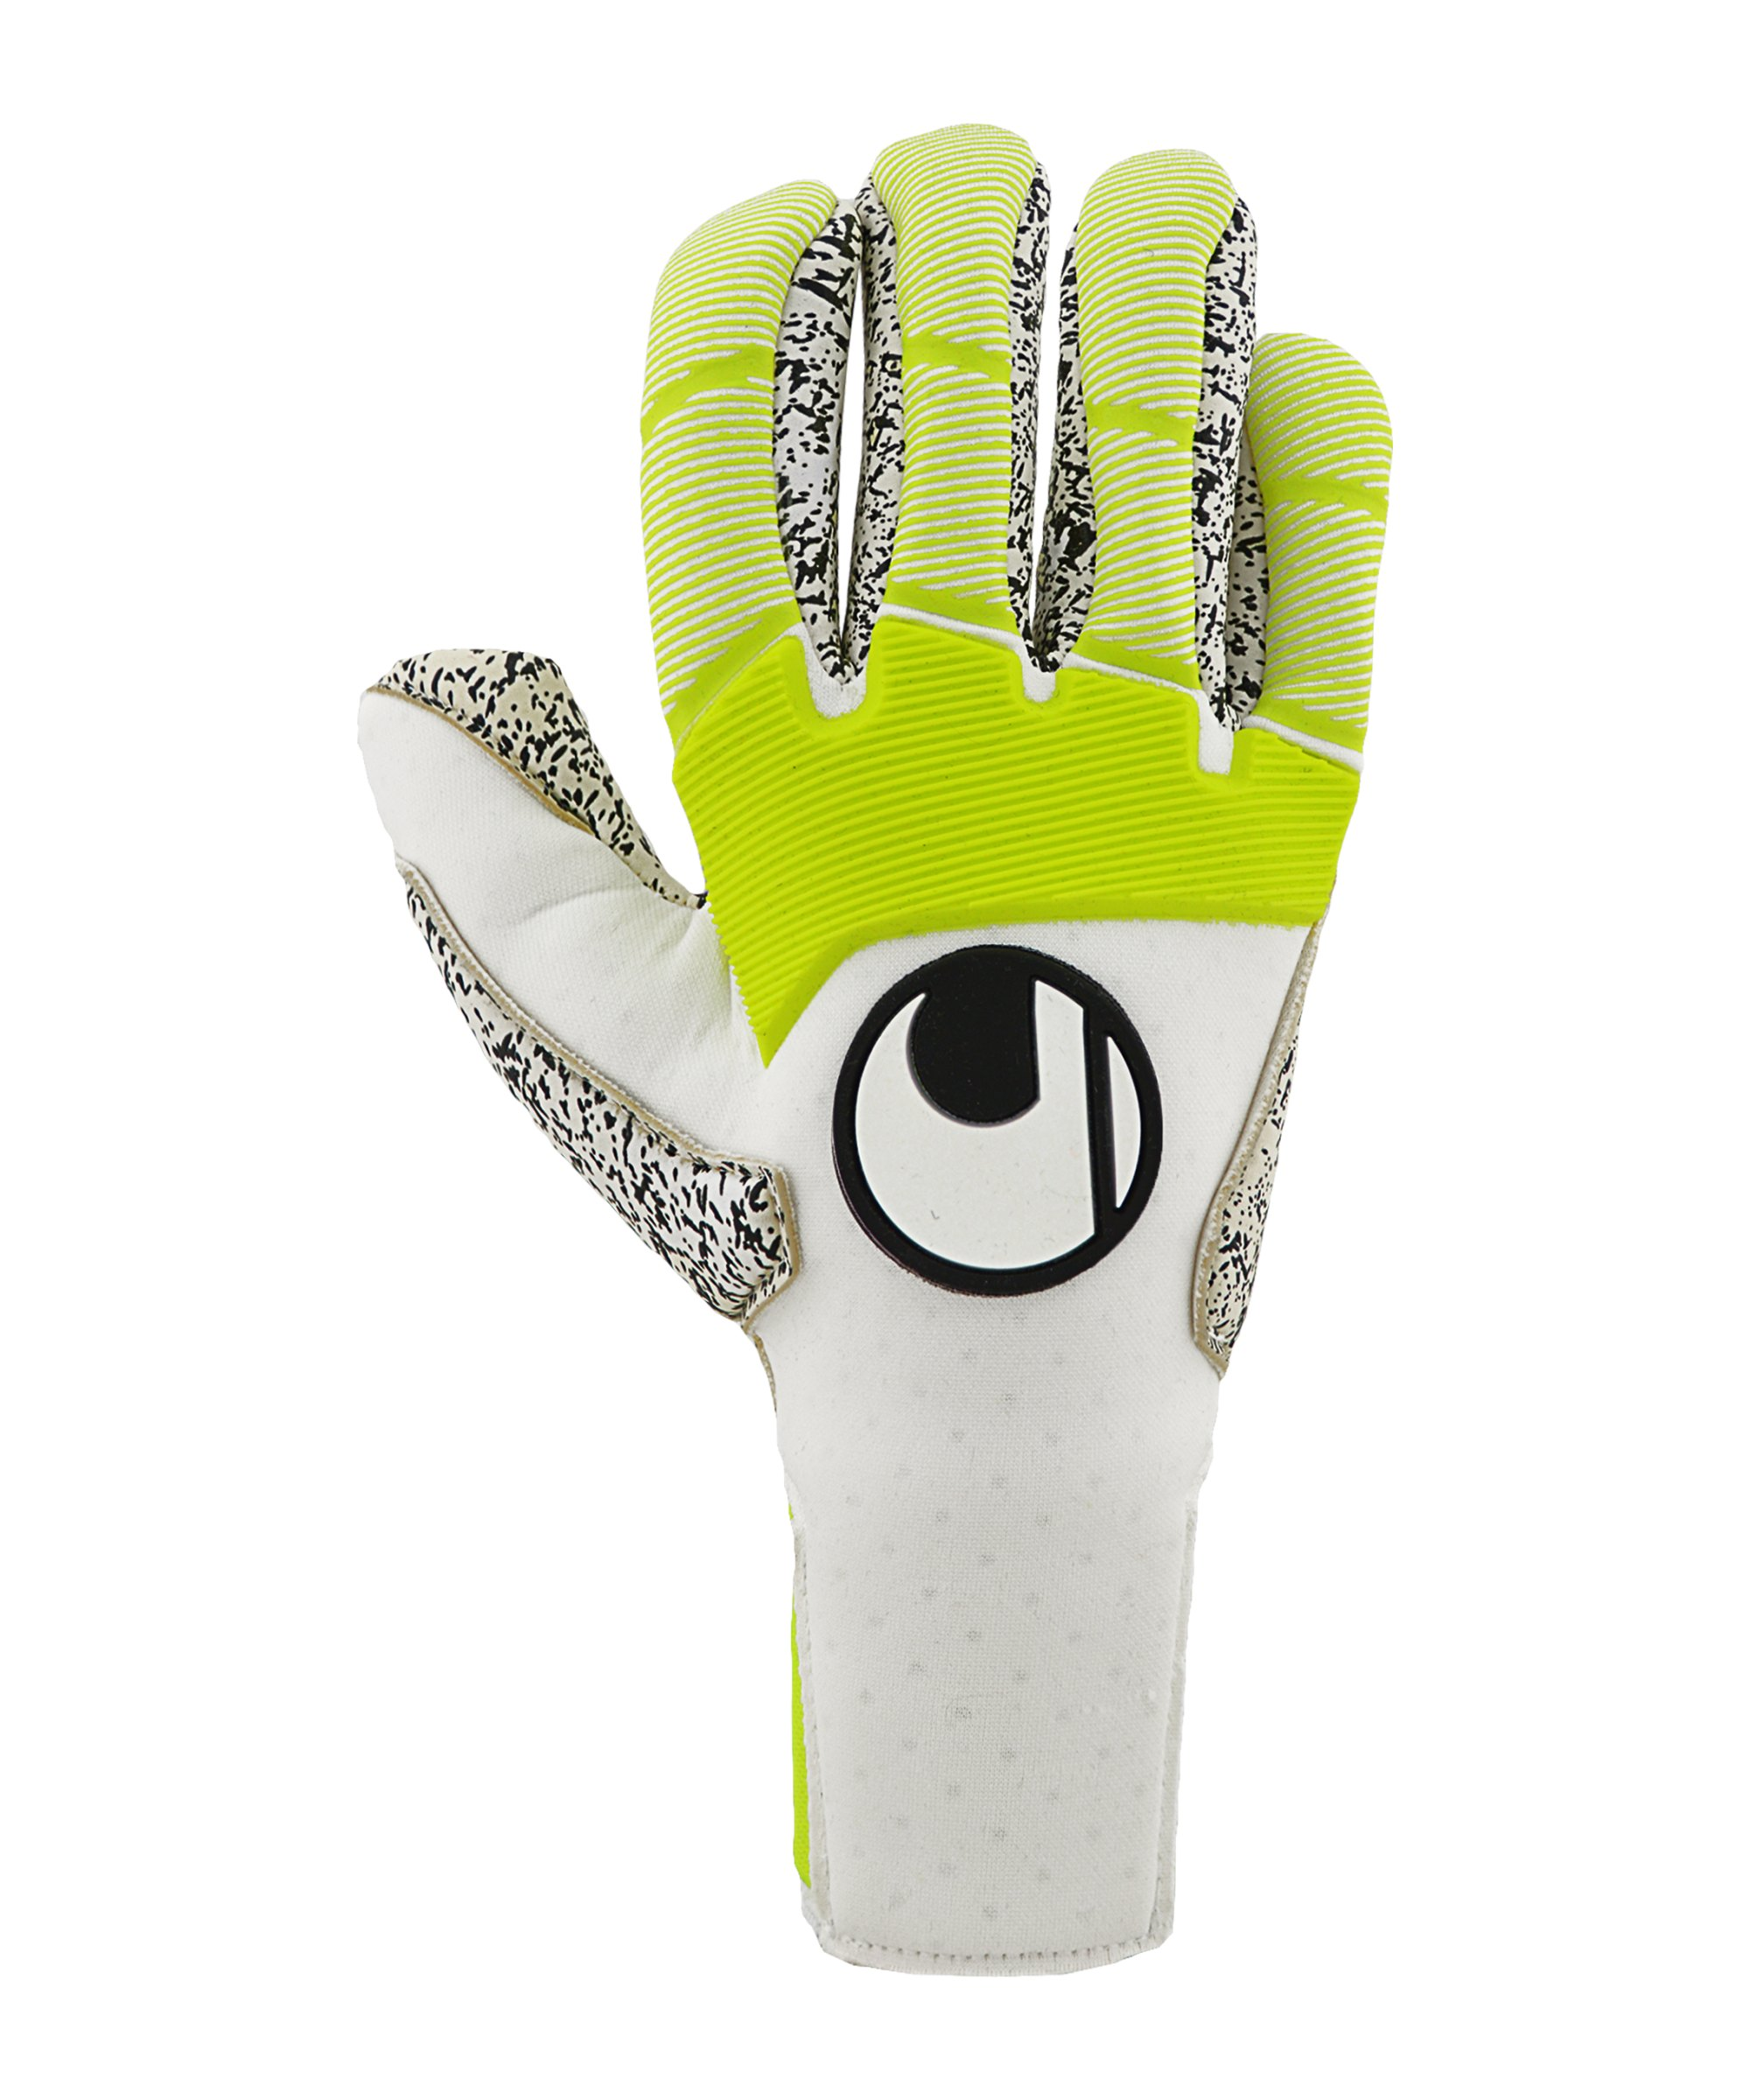 Uhlsport Pure Alliance SG+Finger Sur TW-Handschuh F01 - weiss